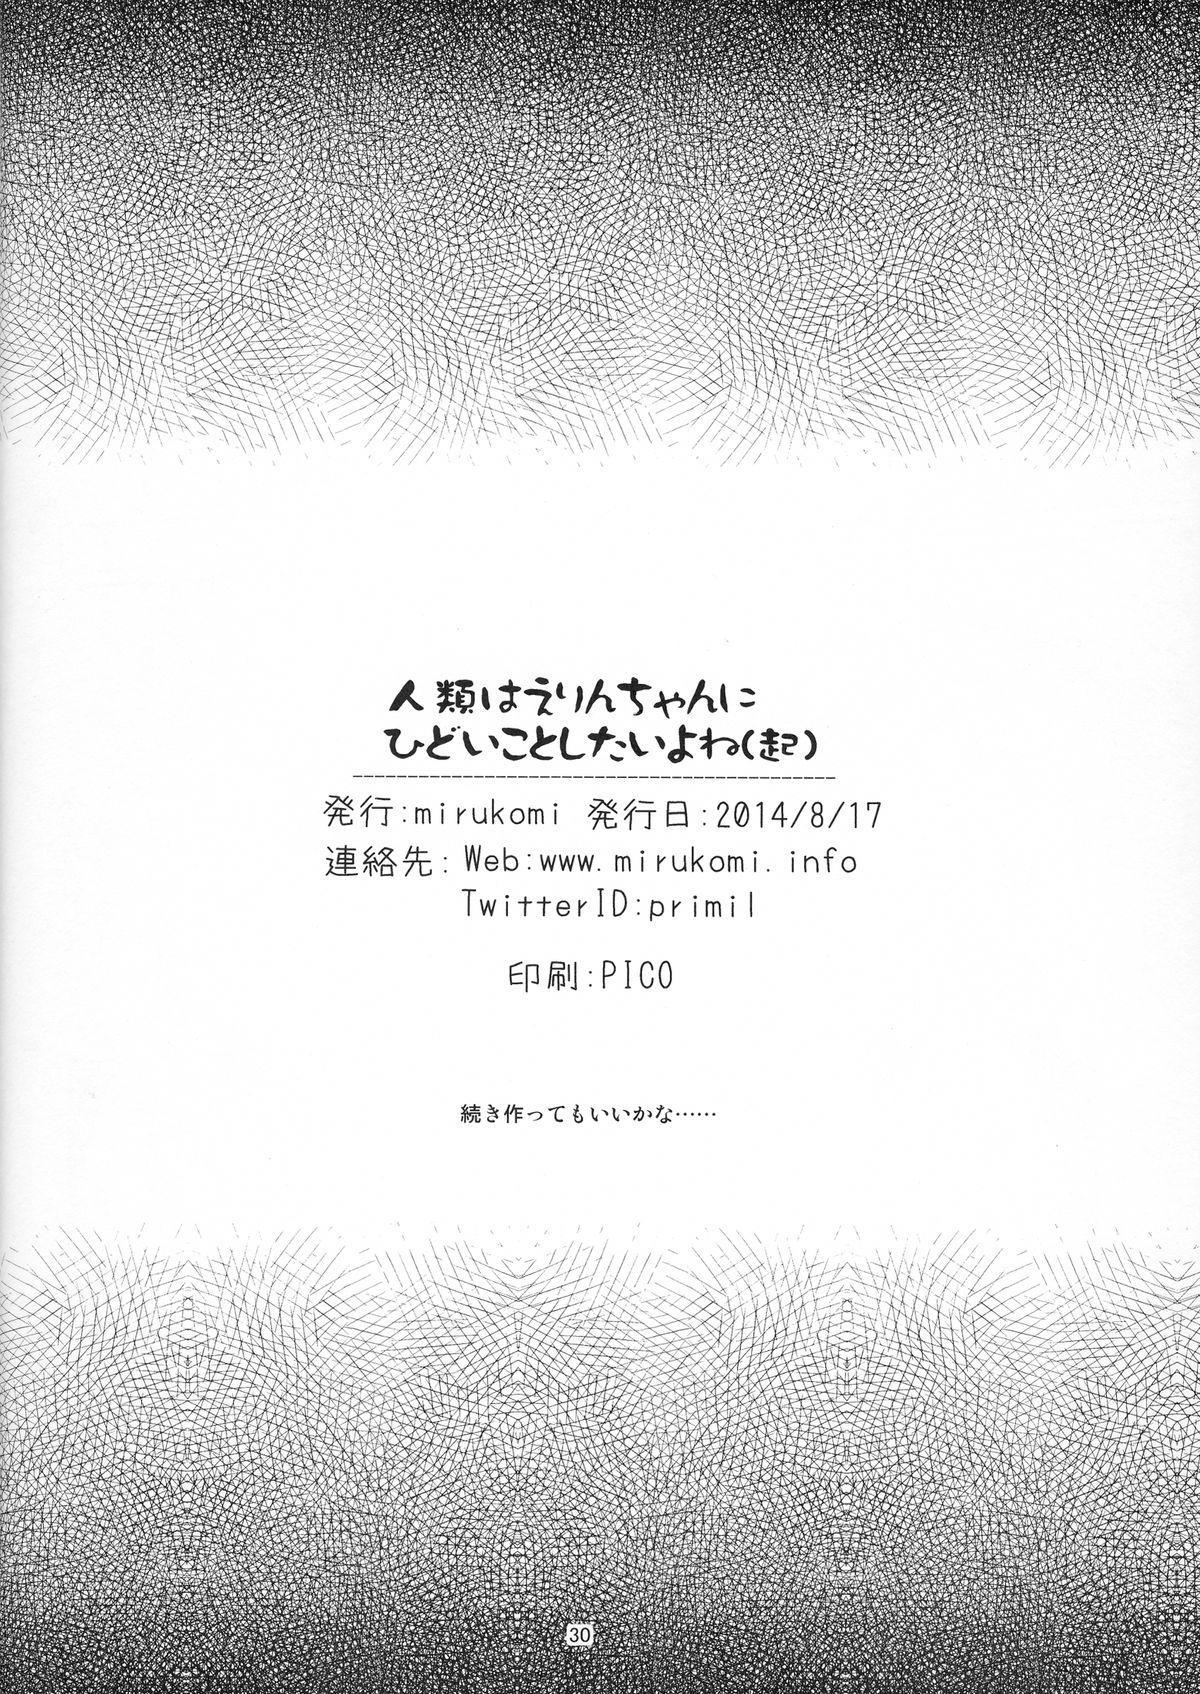 [Mirukomi (PRIMIL)] Human wa Erin-chan ni Hidoi Koto Shitai yo ne - ELIN's the best - (TERA The Exiled Realm of Arborea) 29